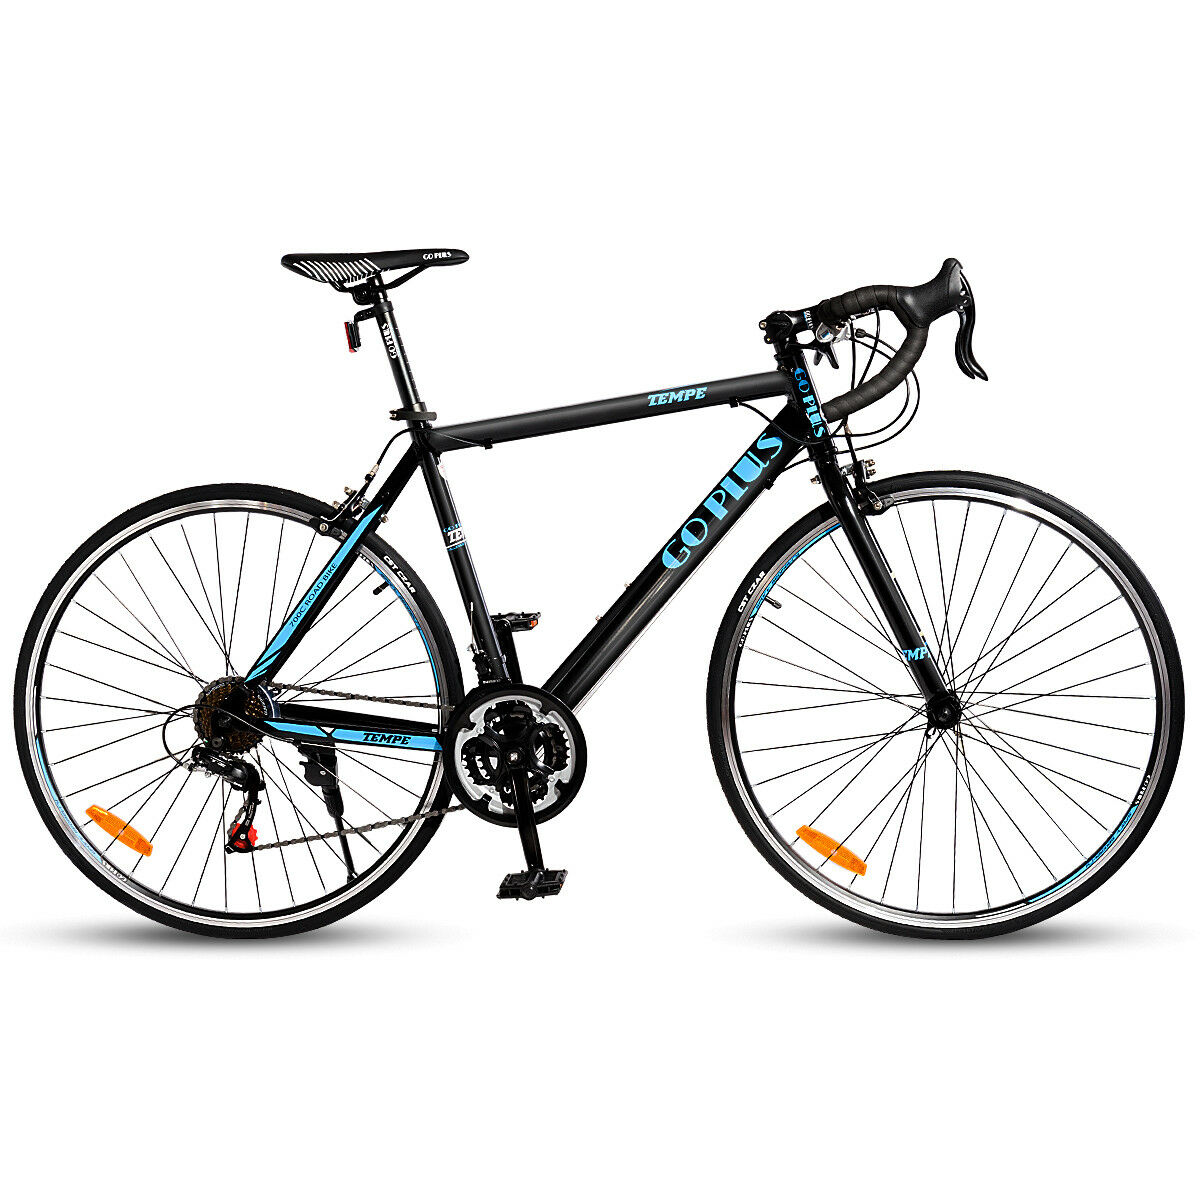 Shimano 700C 52cm Aluminum Road//Commuter Bike Bicycle 21 Speed Quick Release